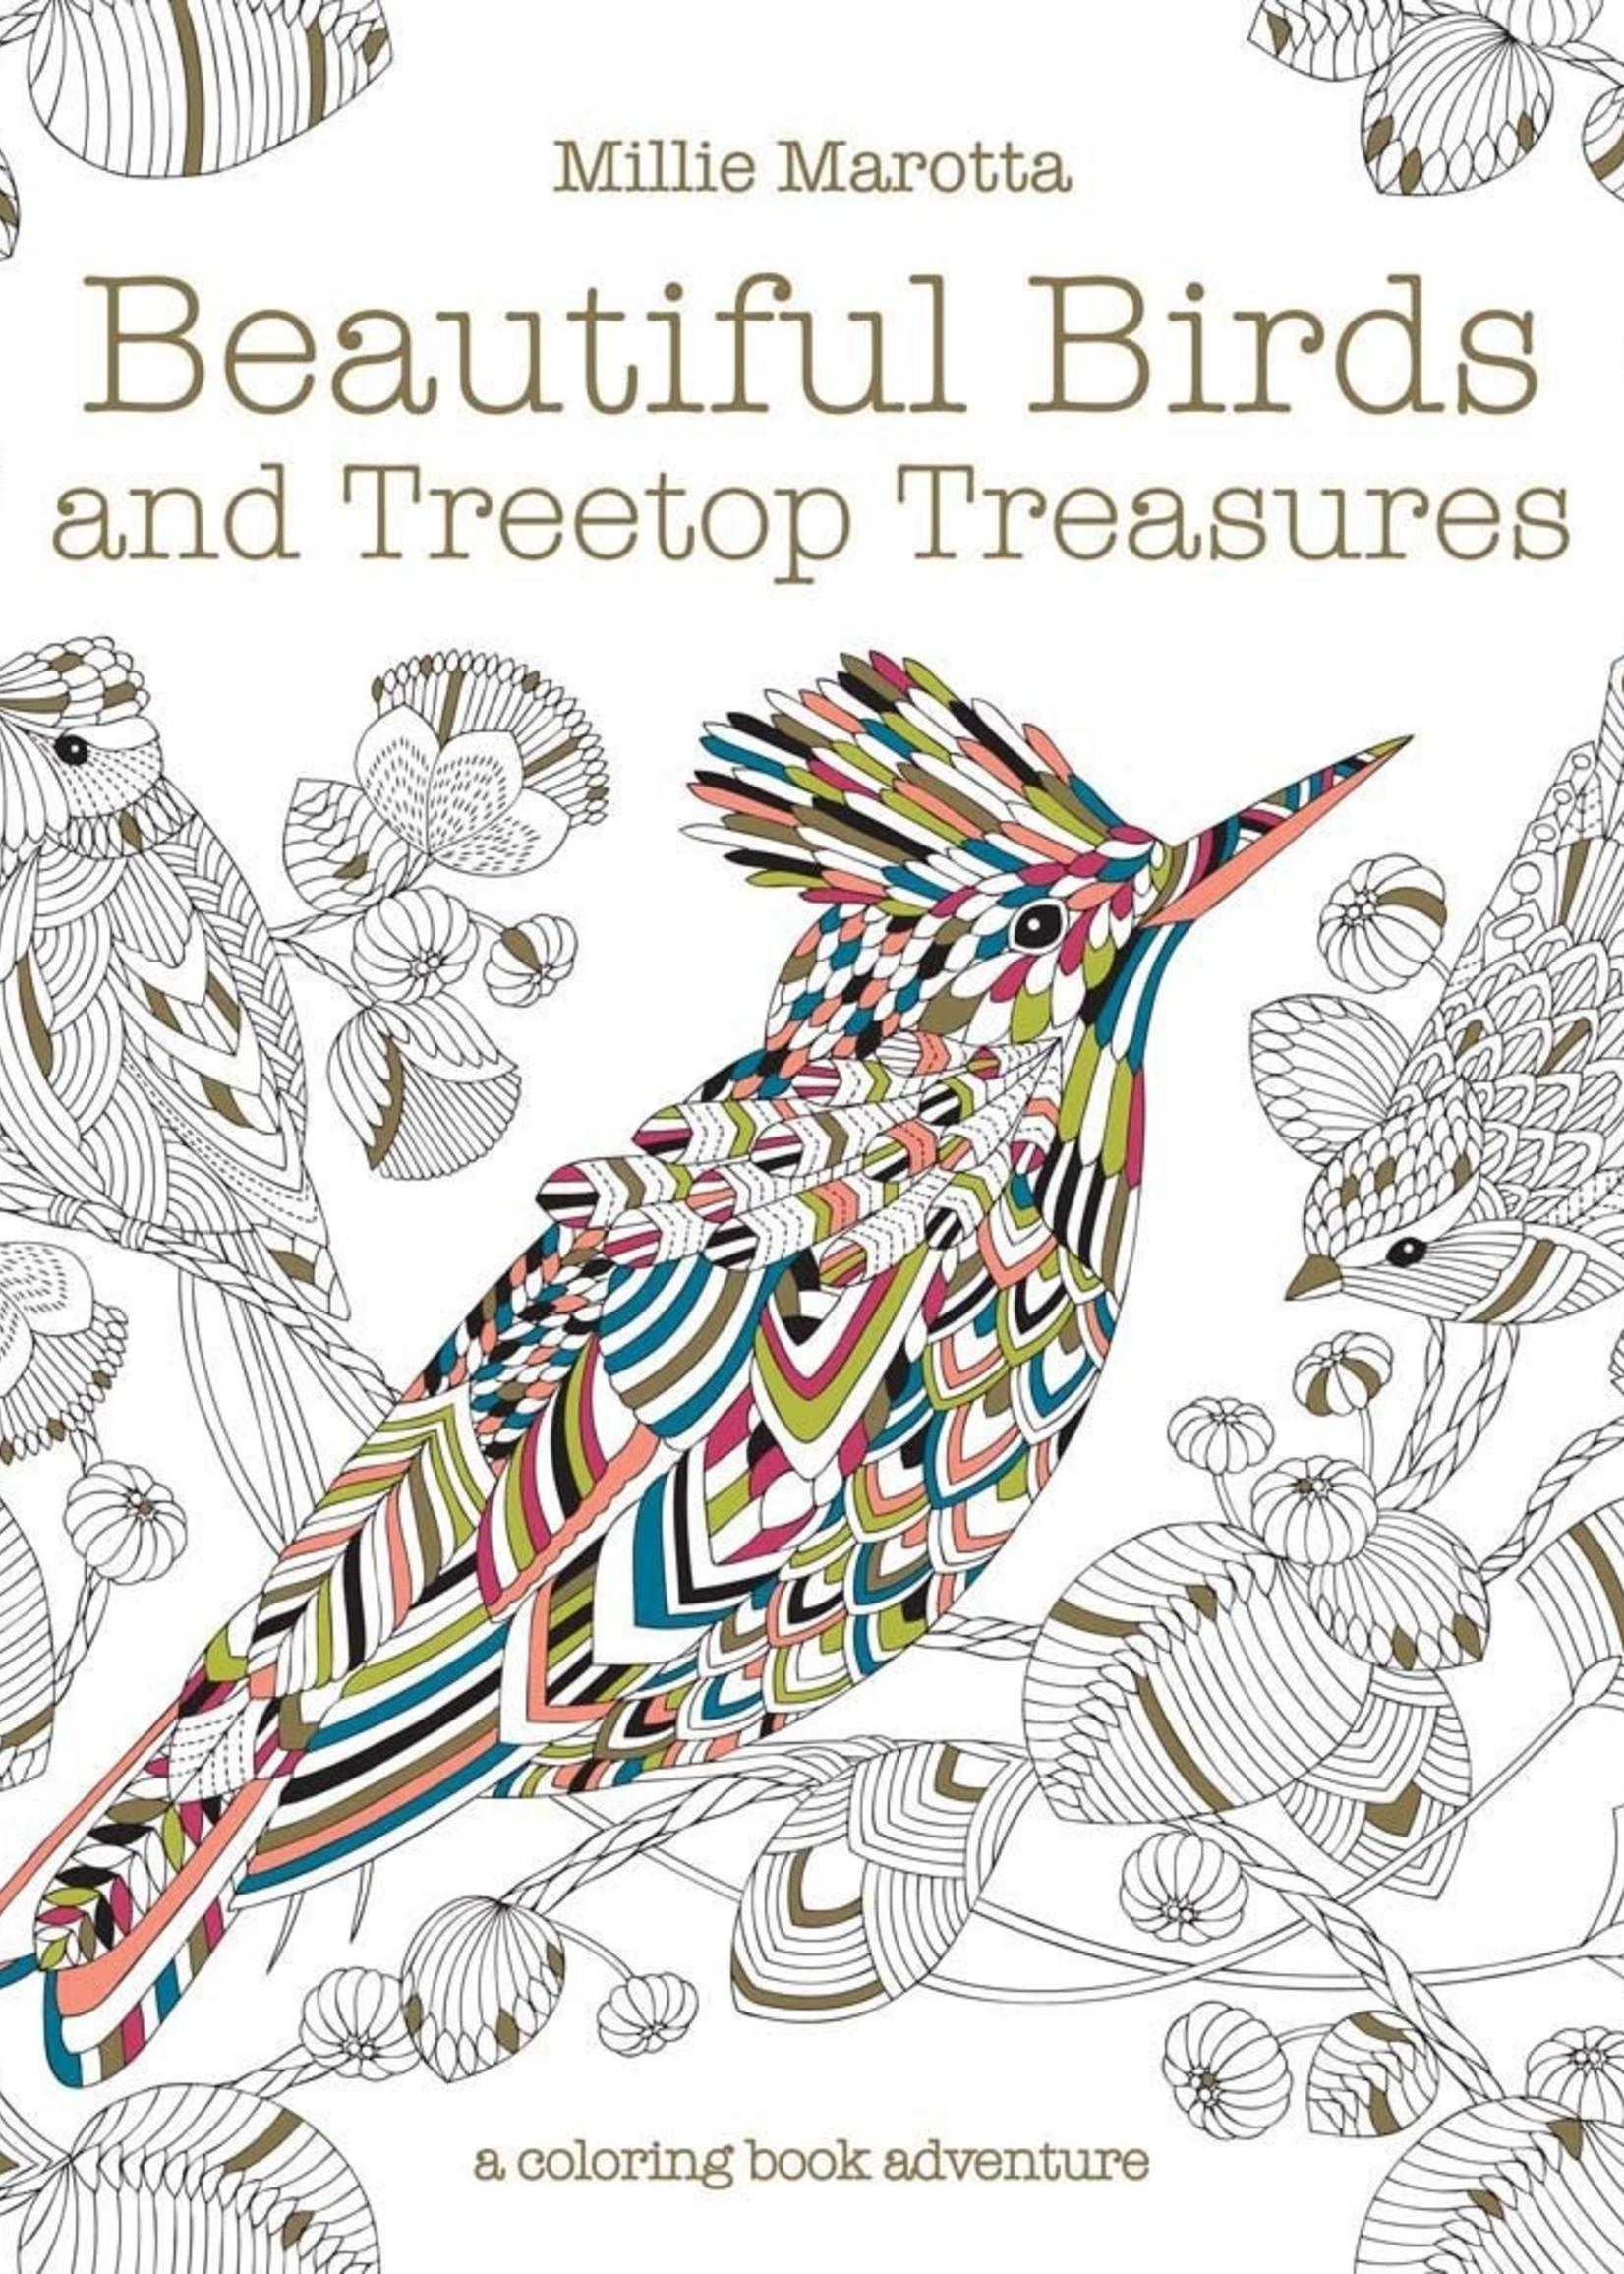 Millie Marotta Adult Coloring Book, Beautiful Birds: Mini Edition - Paperback